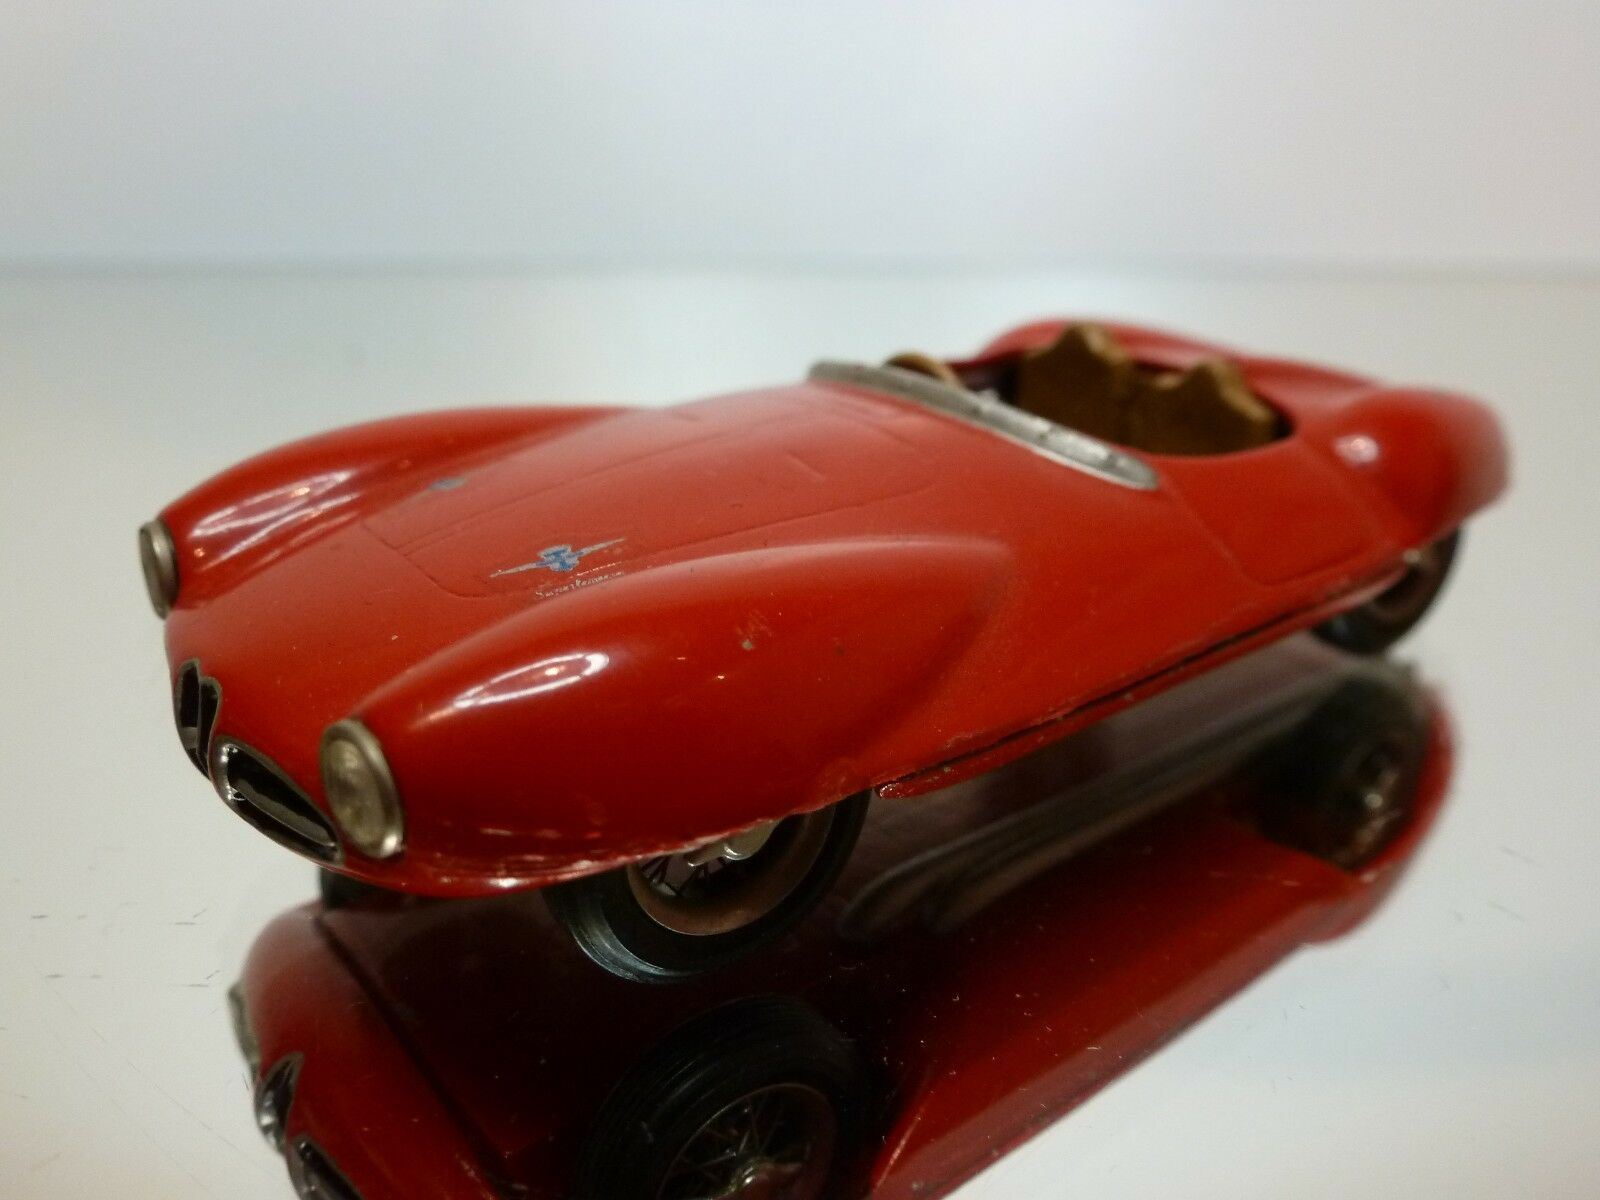 AUTOSTILE 4 KIT  built brianza  ALFA ROMEO 1900 C52 SPYDER DISCO VOLANTE - 1:43